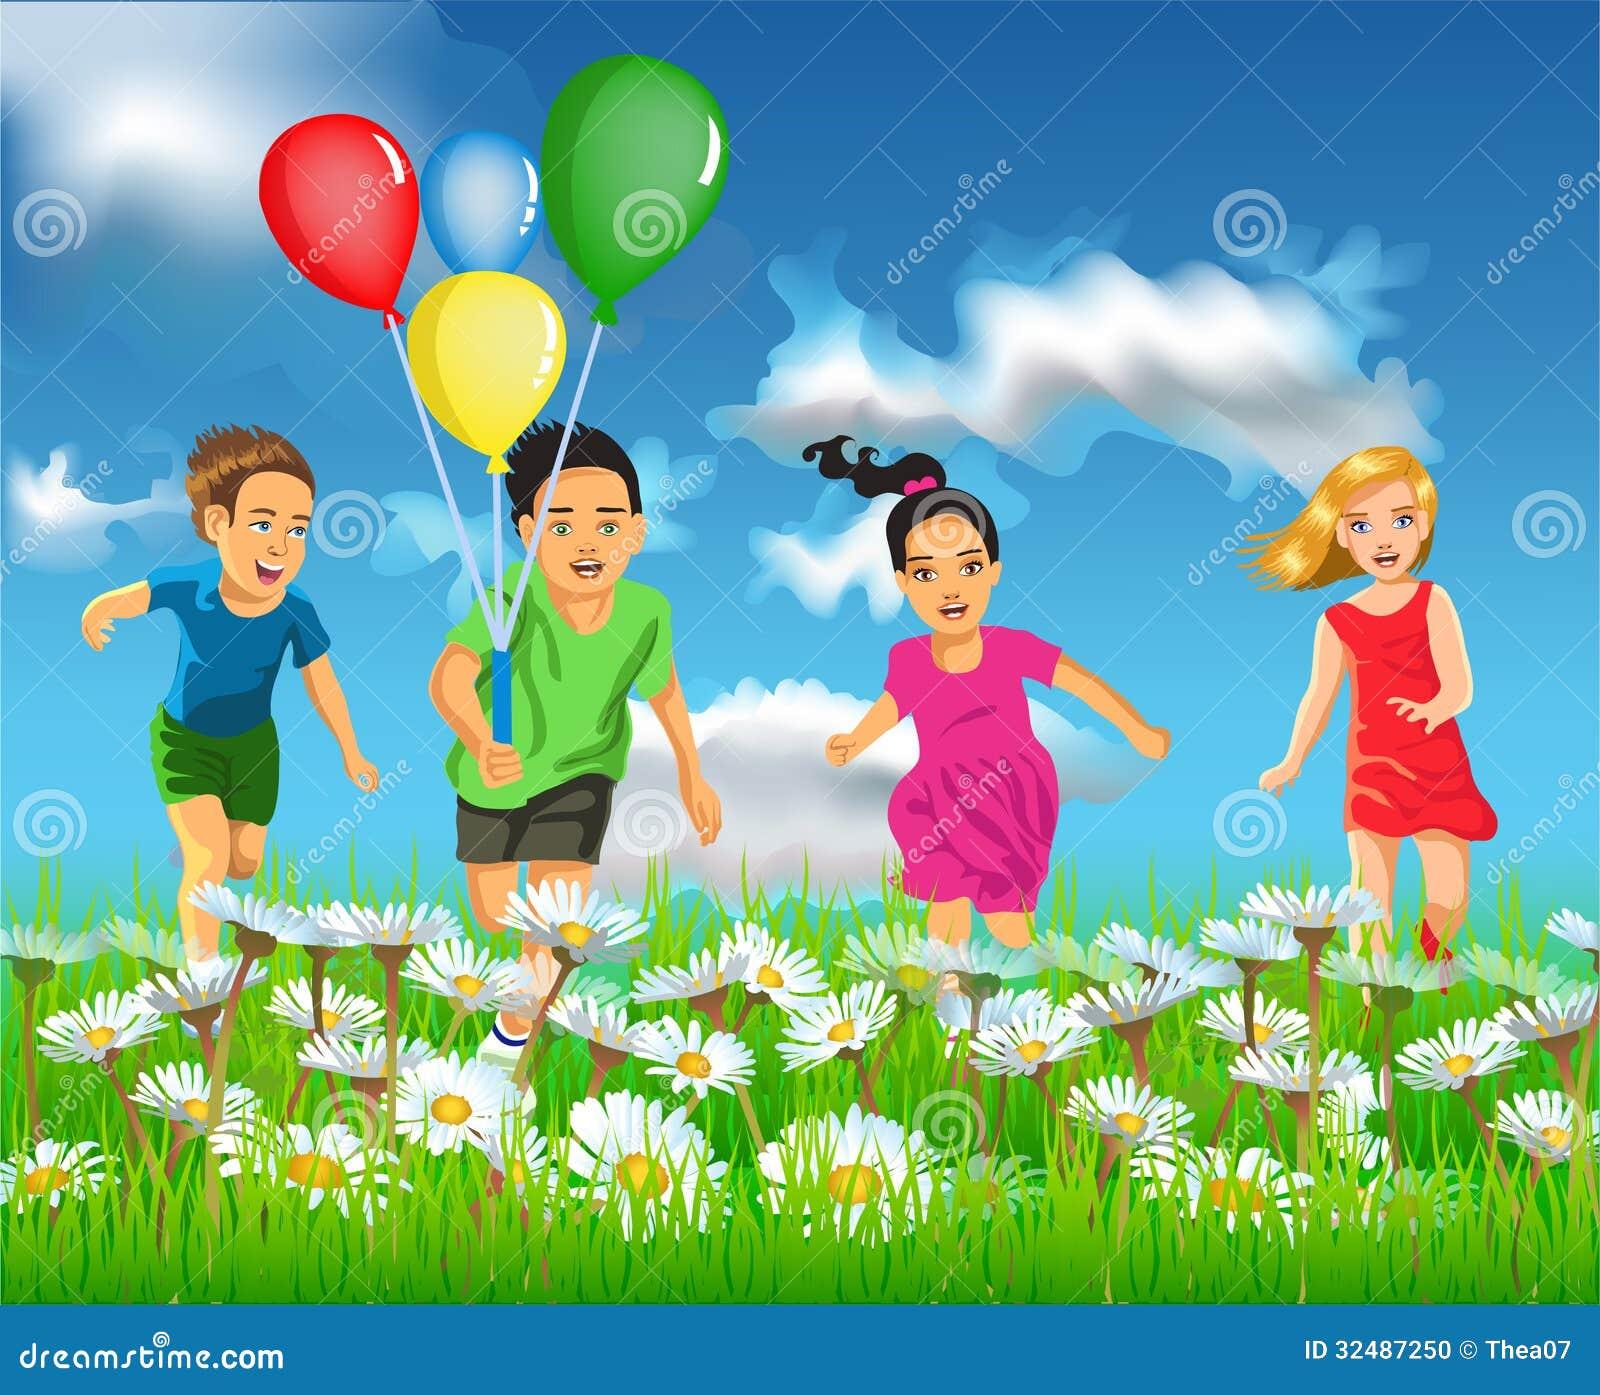 happy children running in the field stock vector illustration of